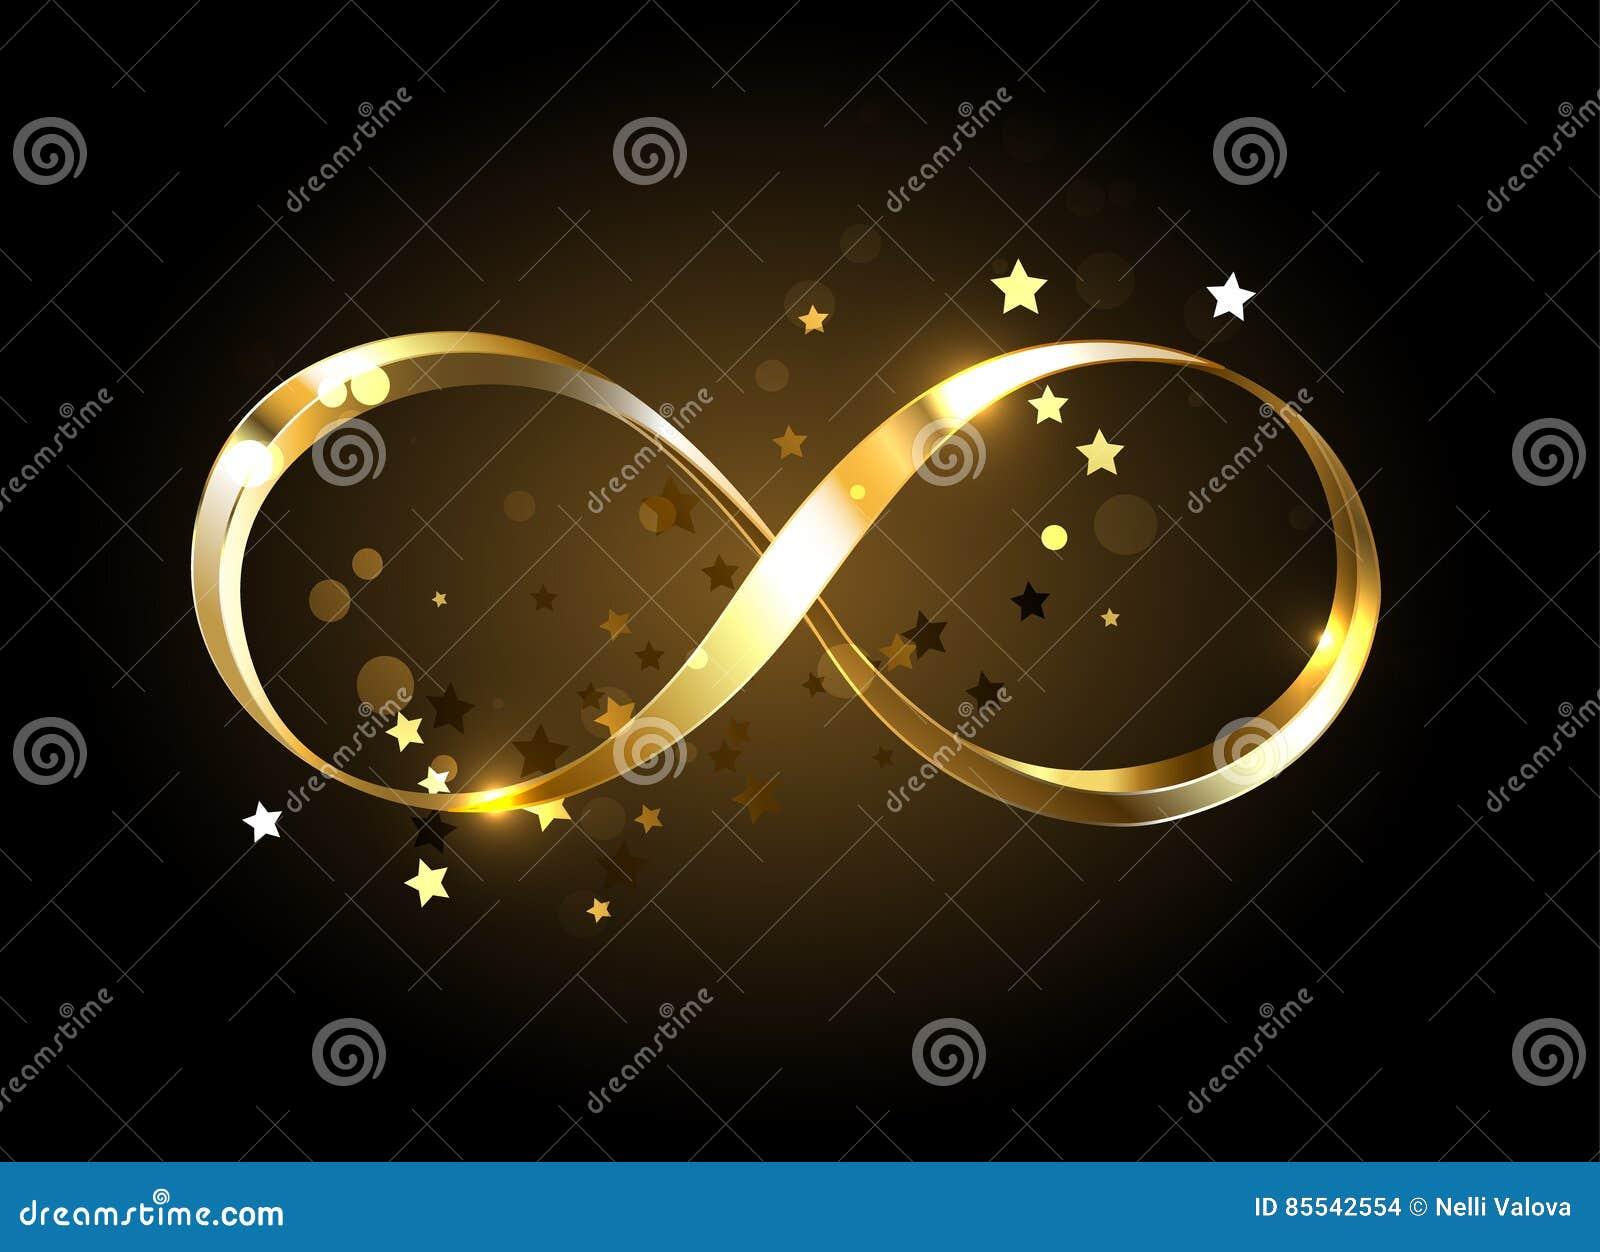 Golden infinity symbol stock vector image of illustration 85542554 golden infinity symbol biocorpaavc